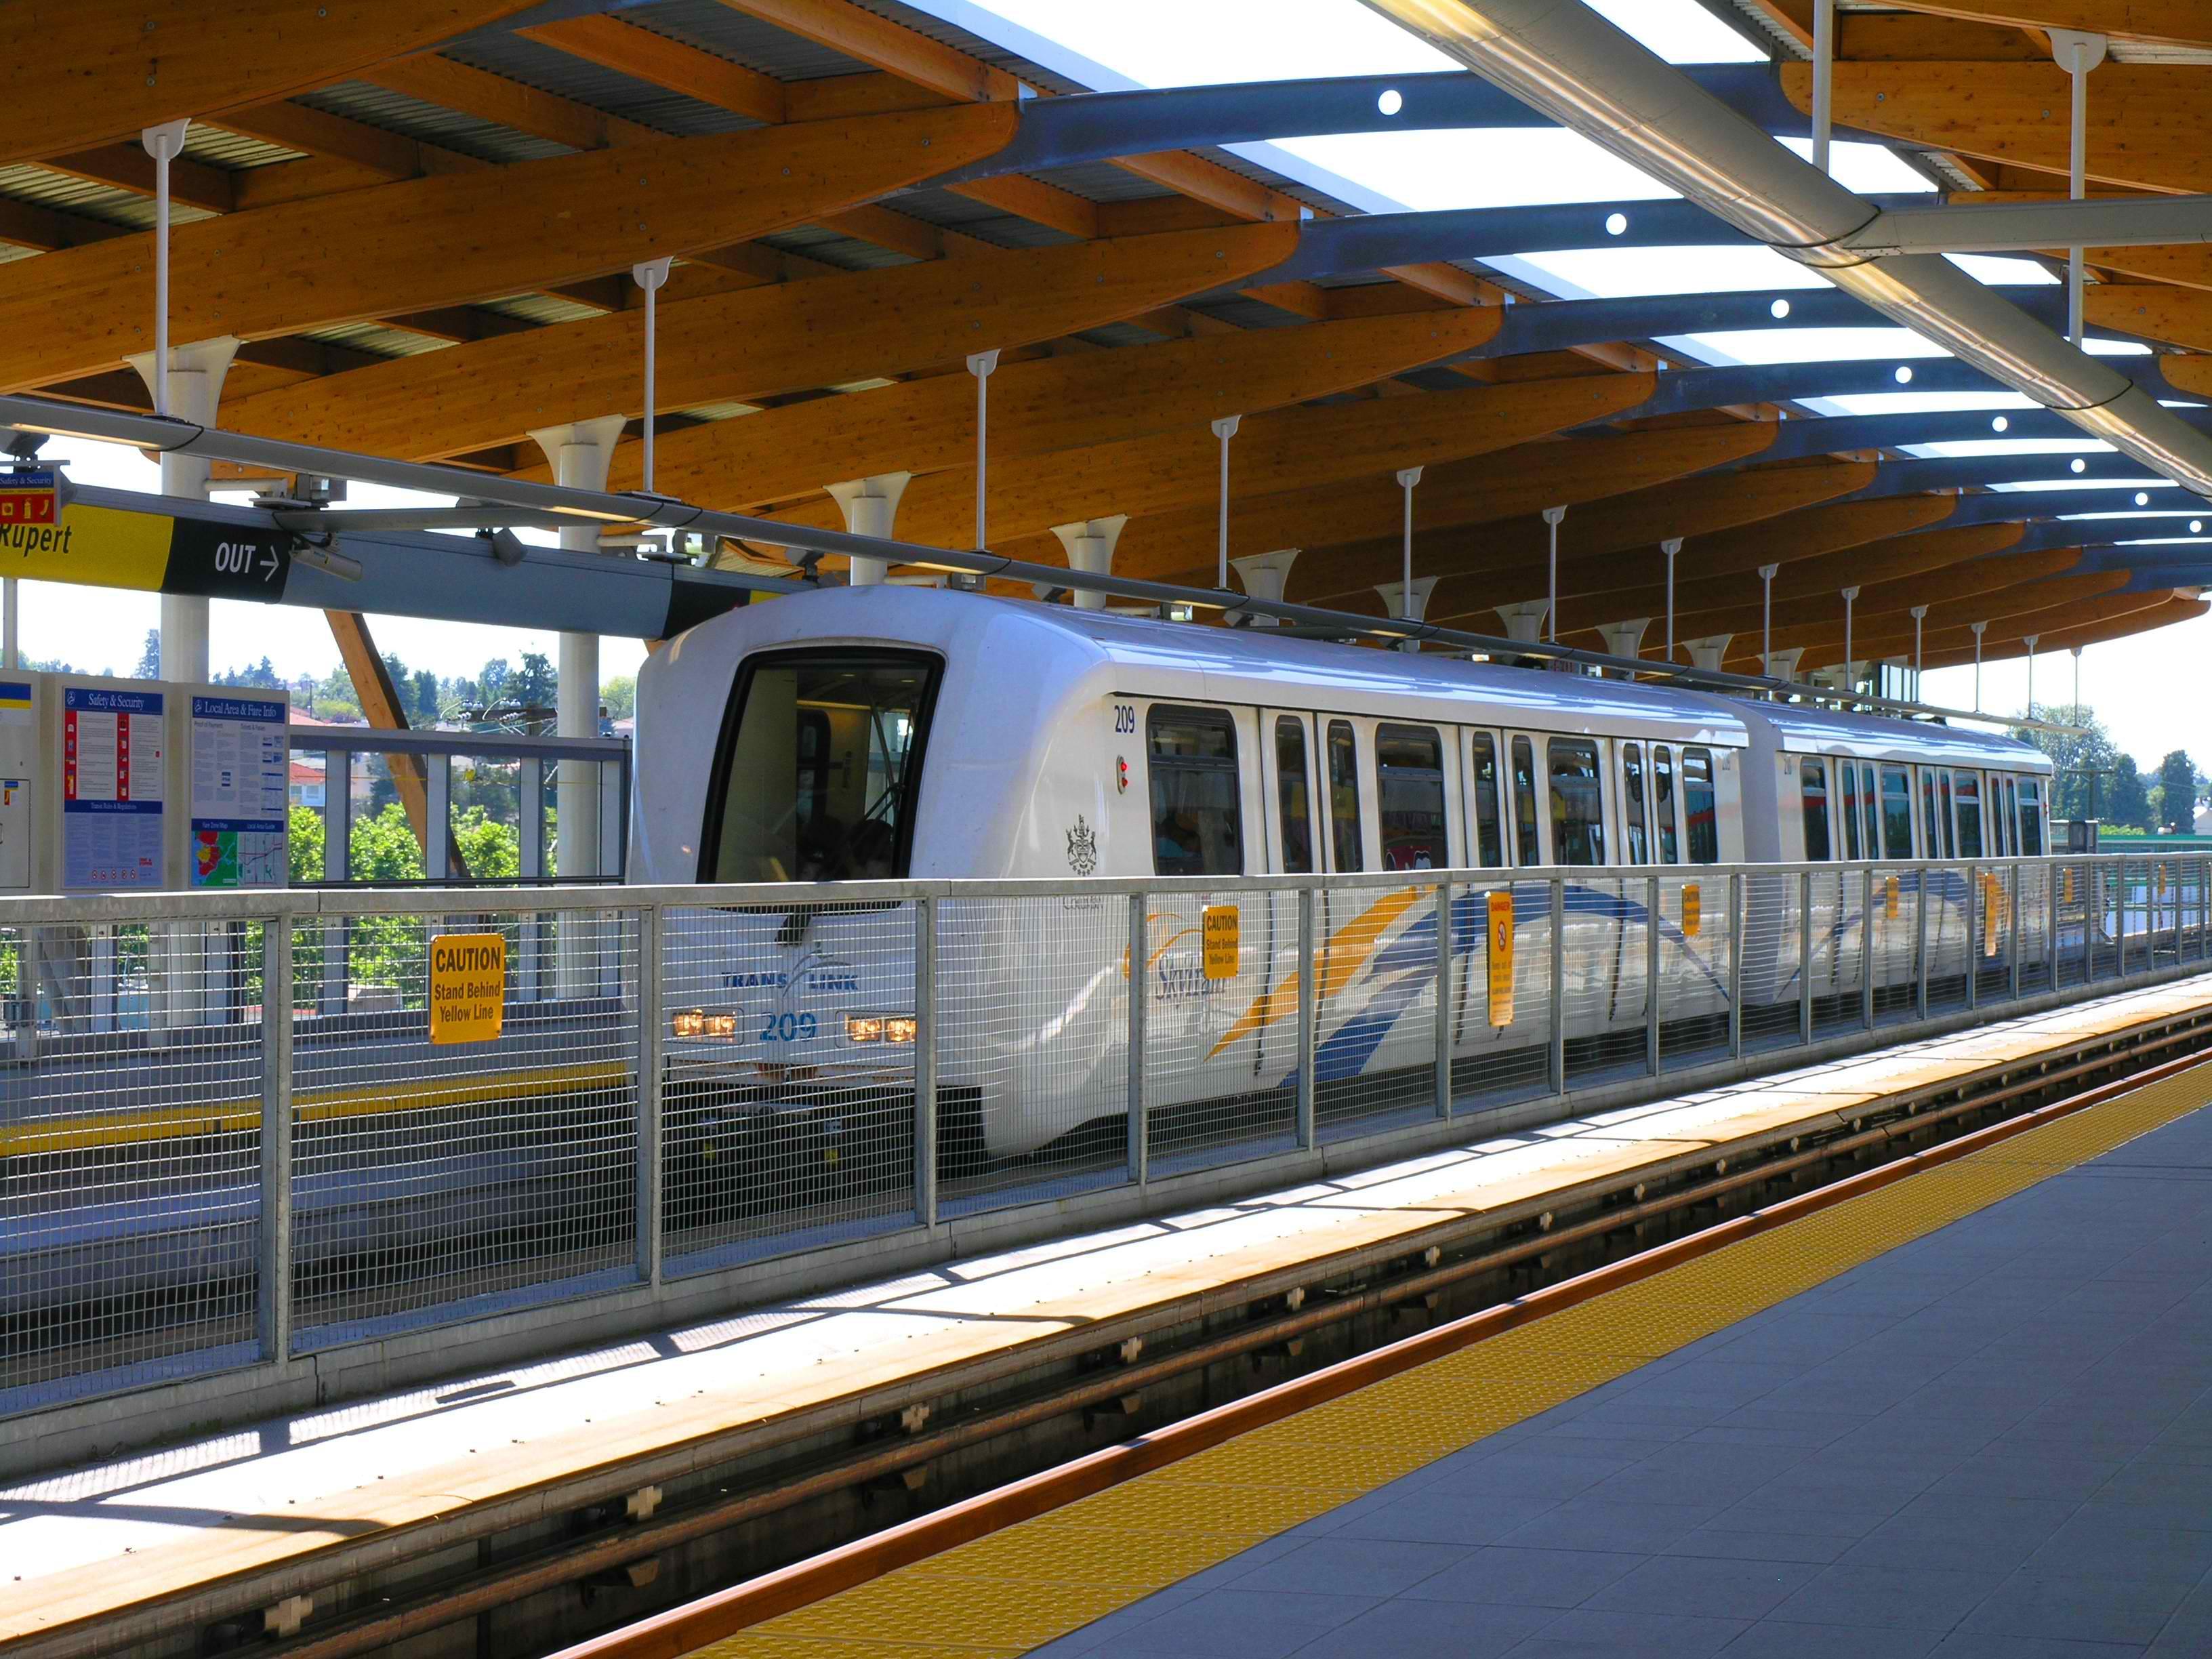 Rupert Station, Vancouver SkyTrain (Wikipedia photo)